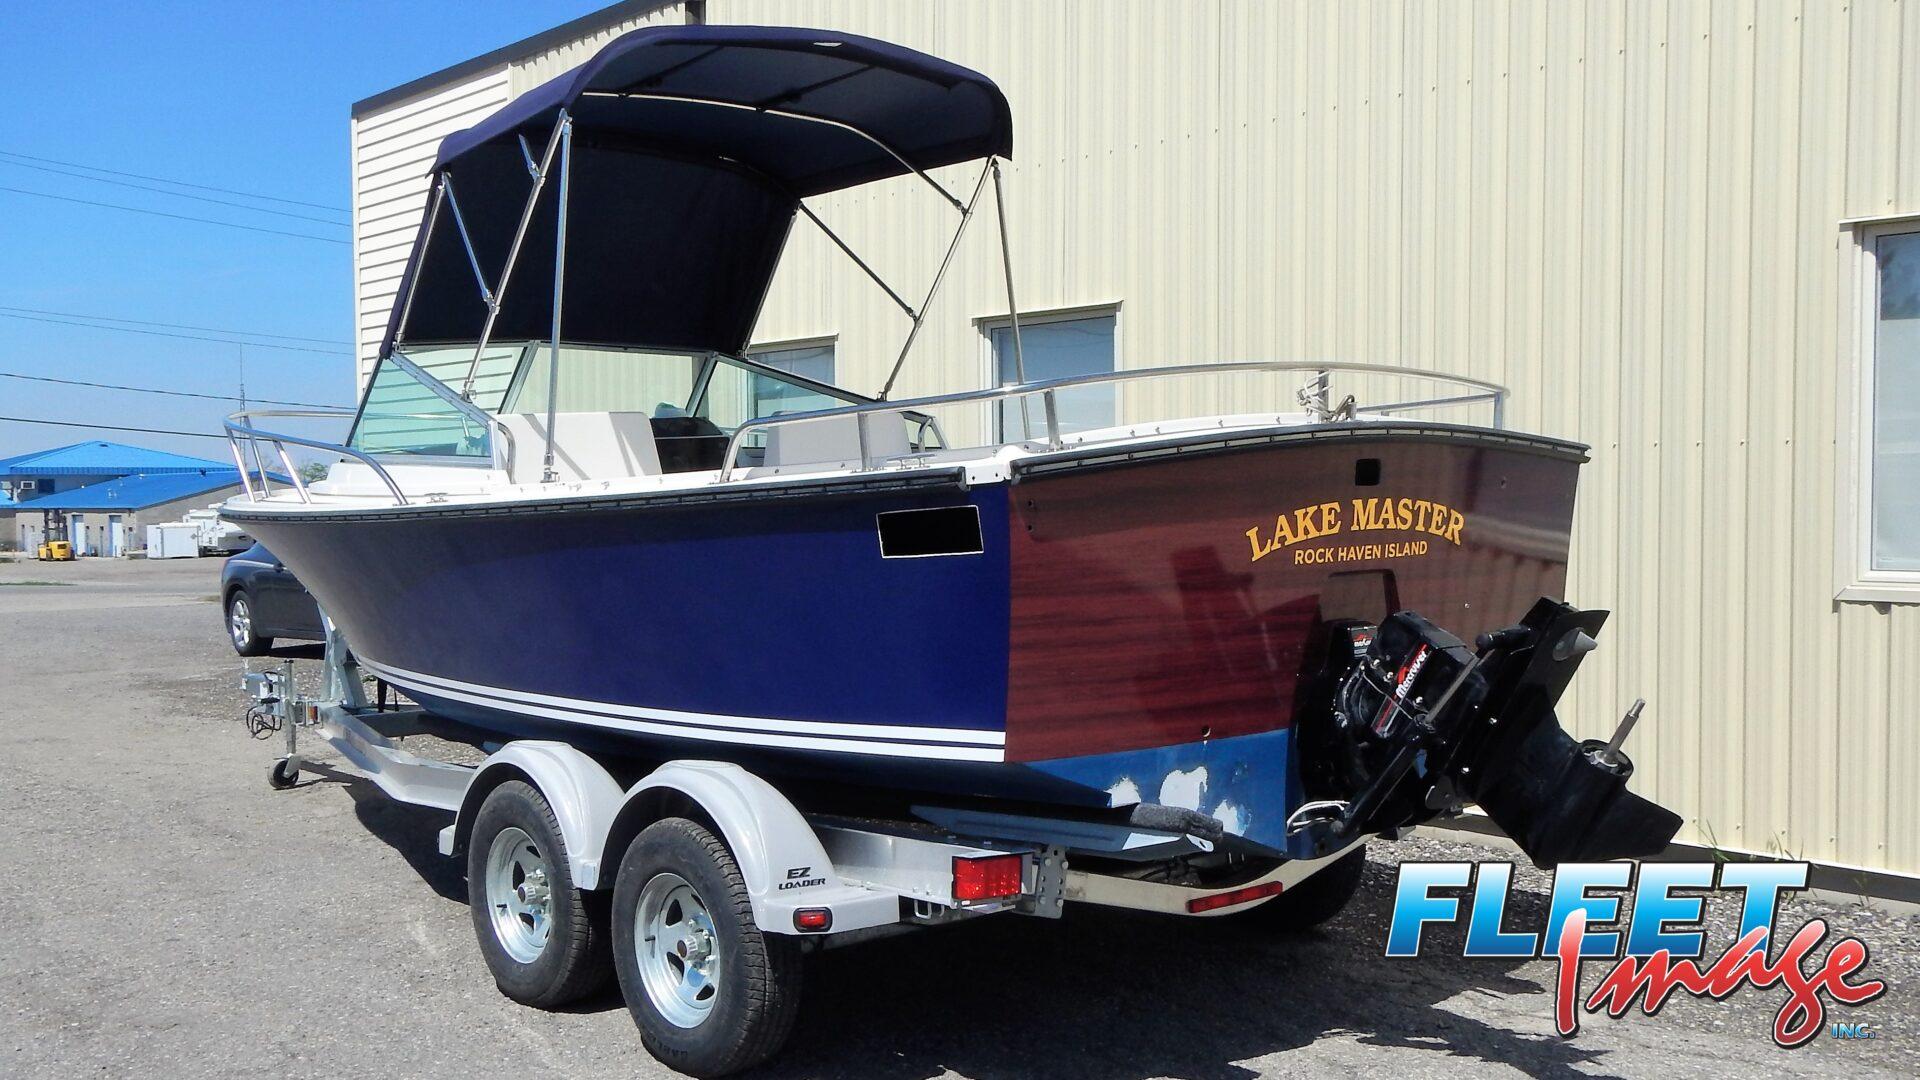 Lake Master Rock Haven Island sticker on a boat